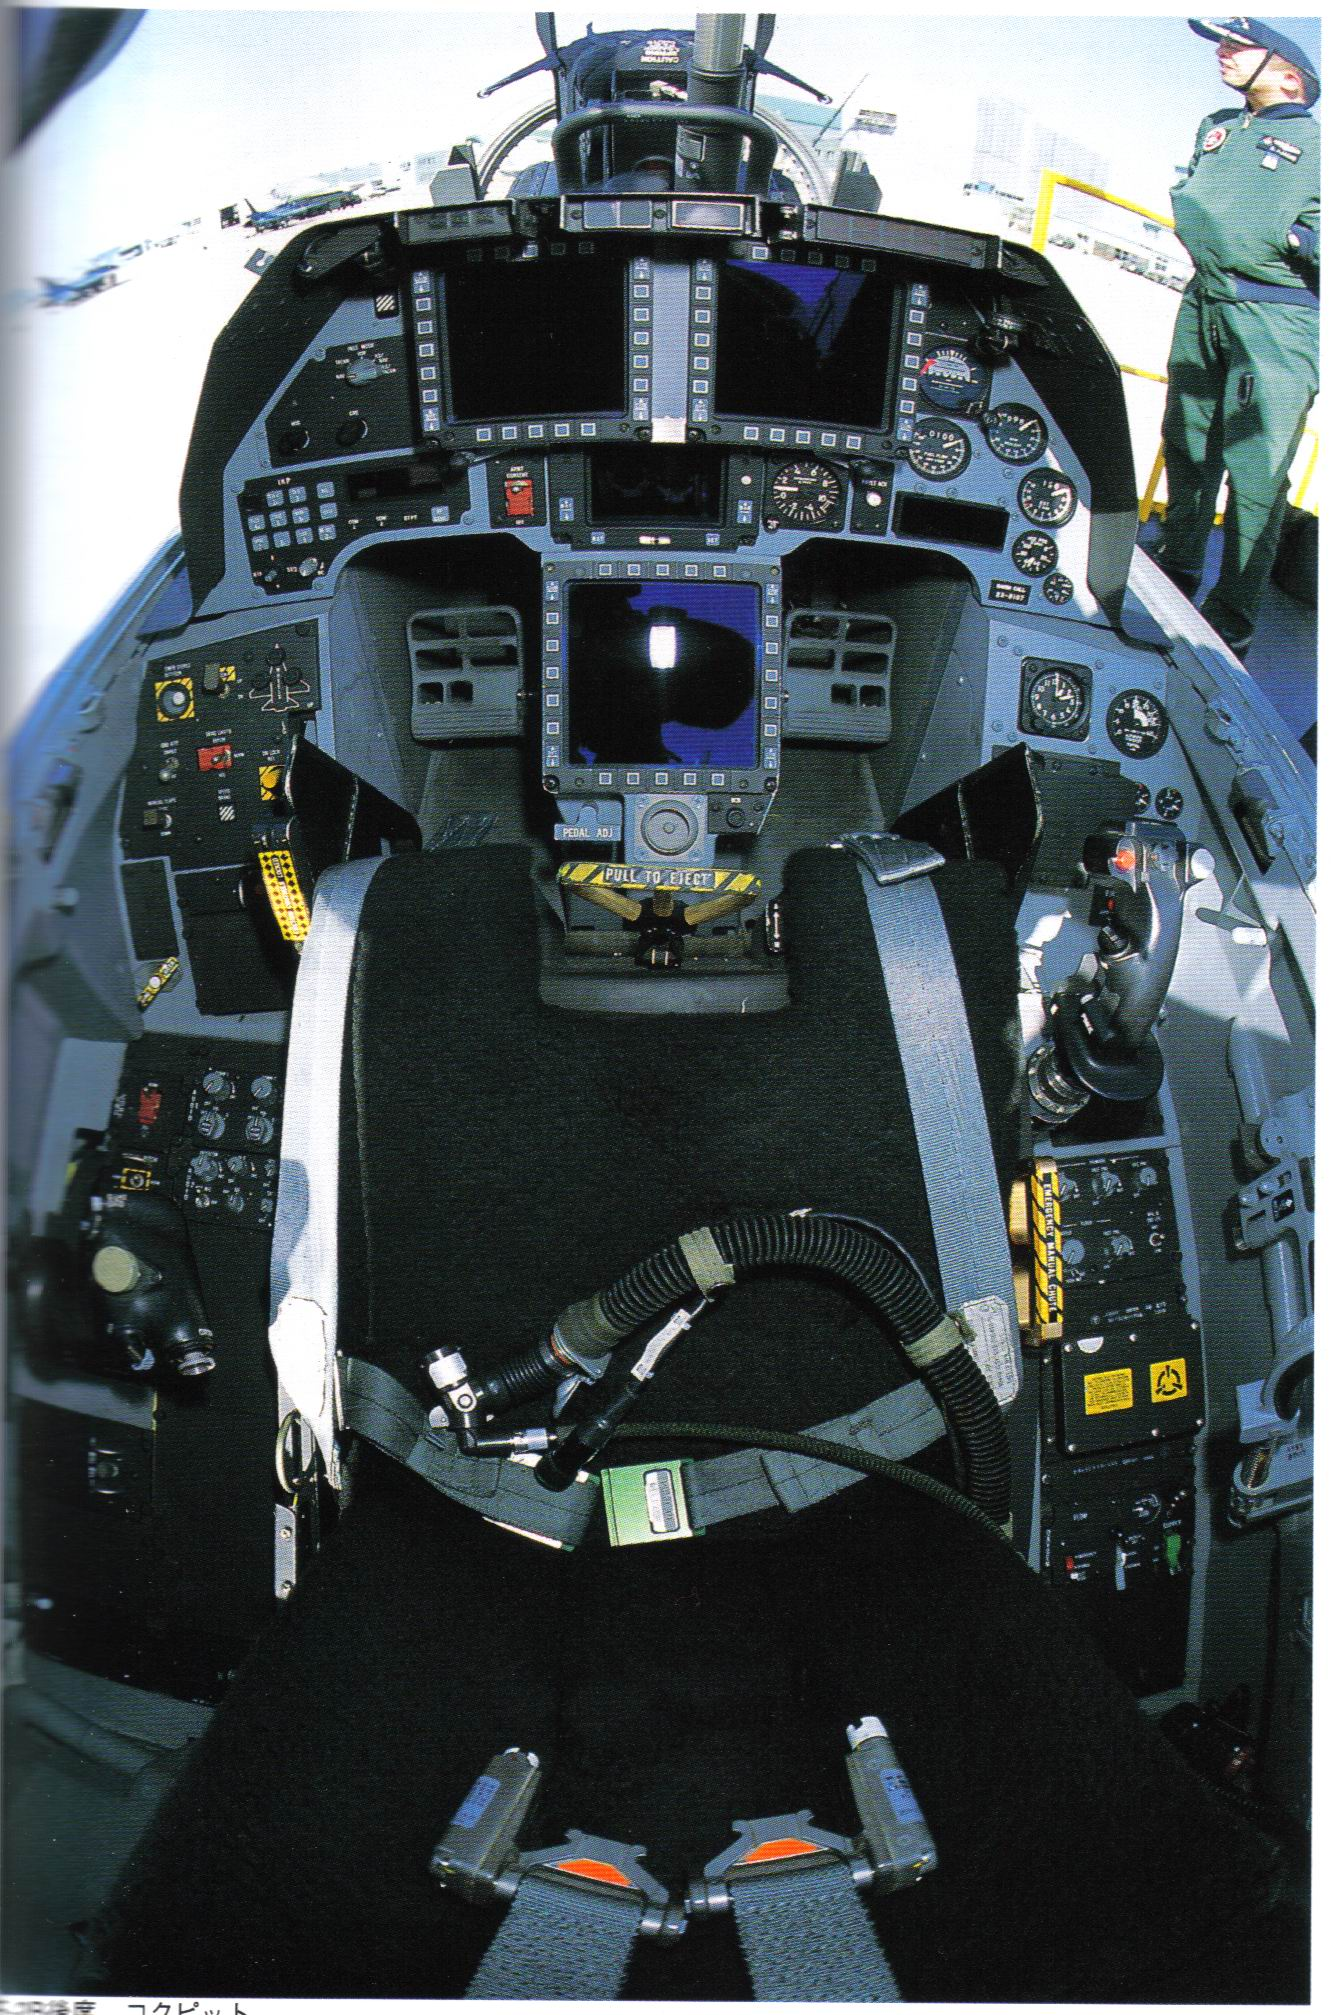 F-16 Cockpit Pictures